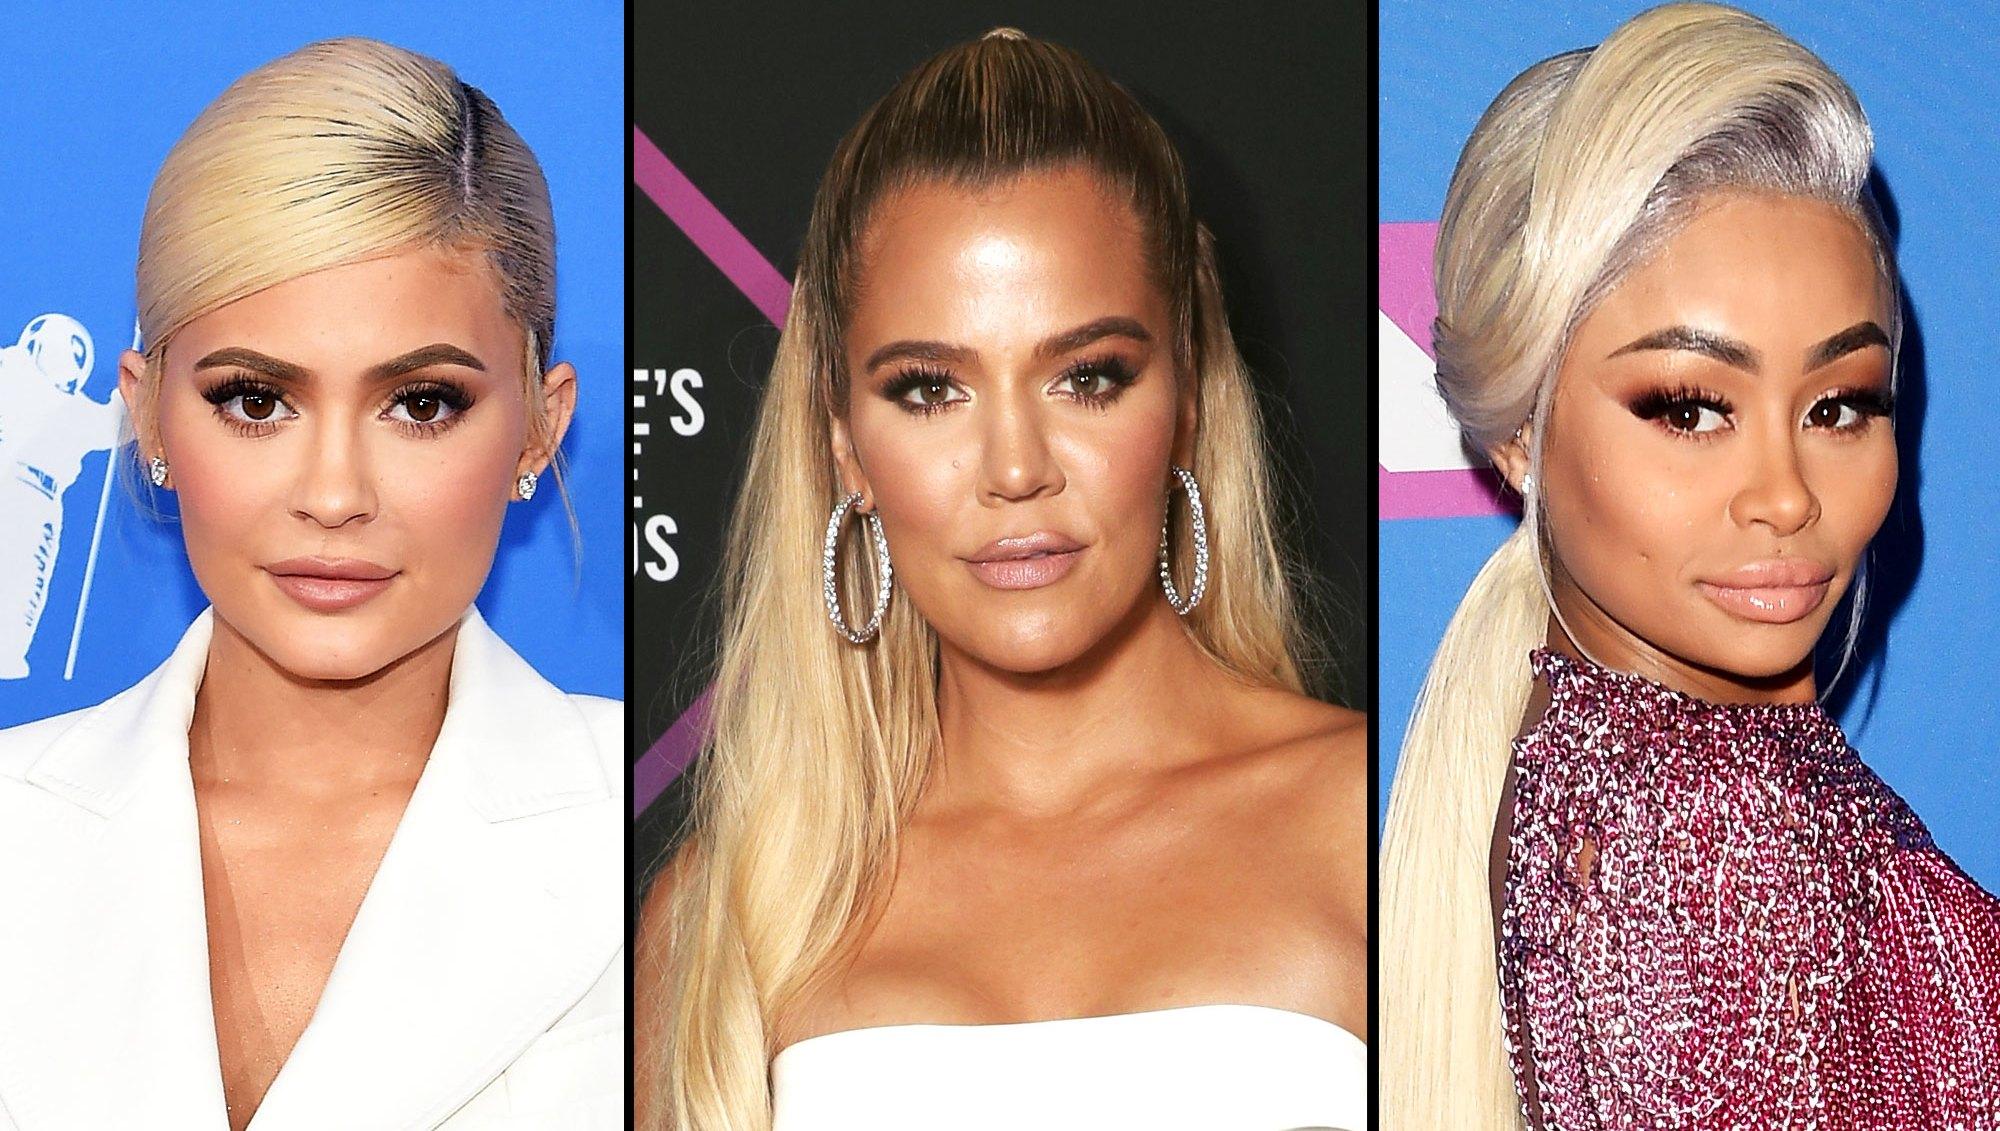 Kylie Jenner, Khloé Kardashian and Blac Chyna